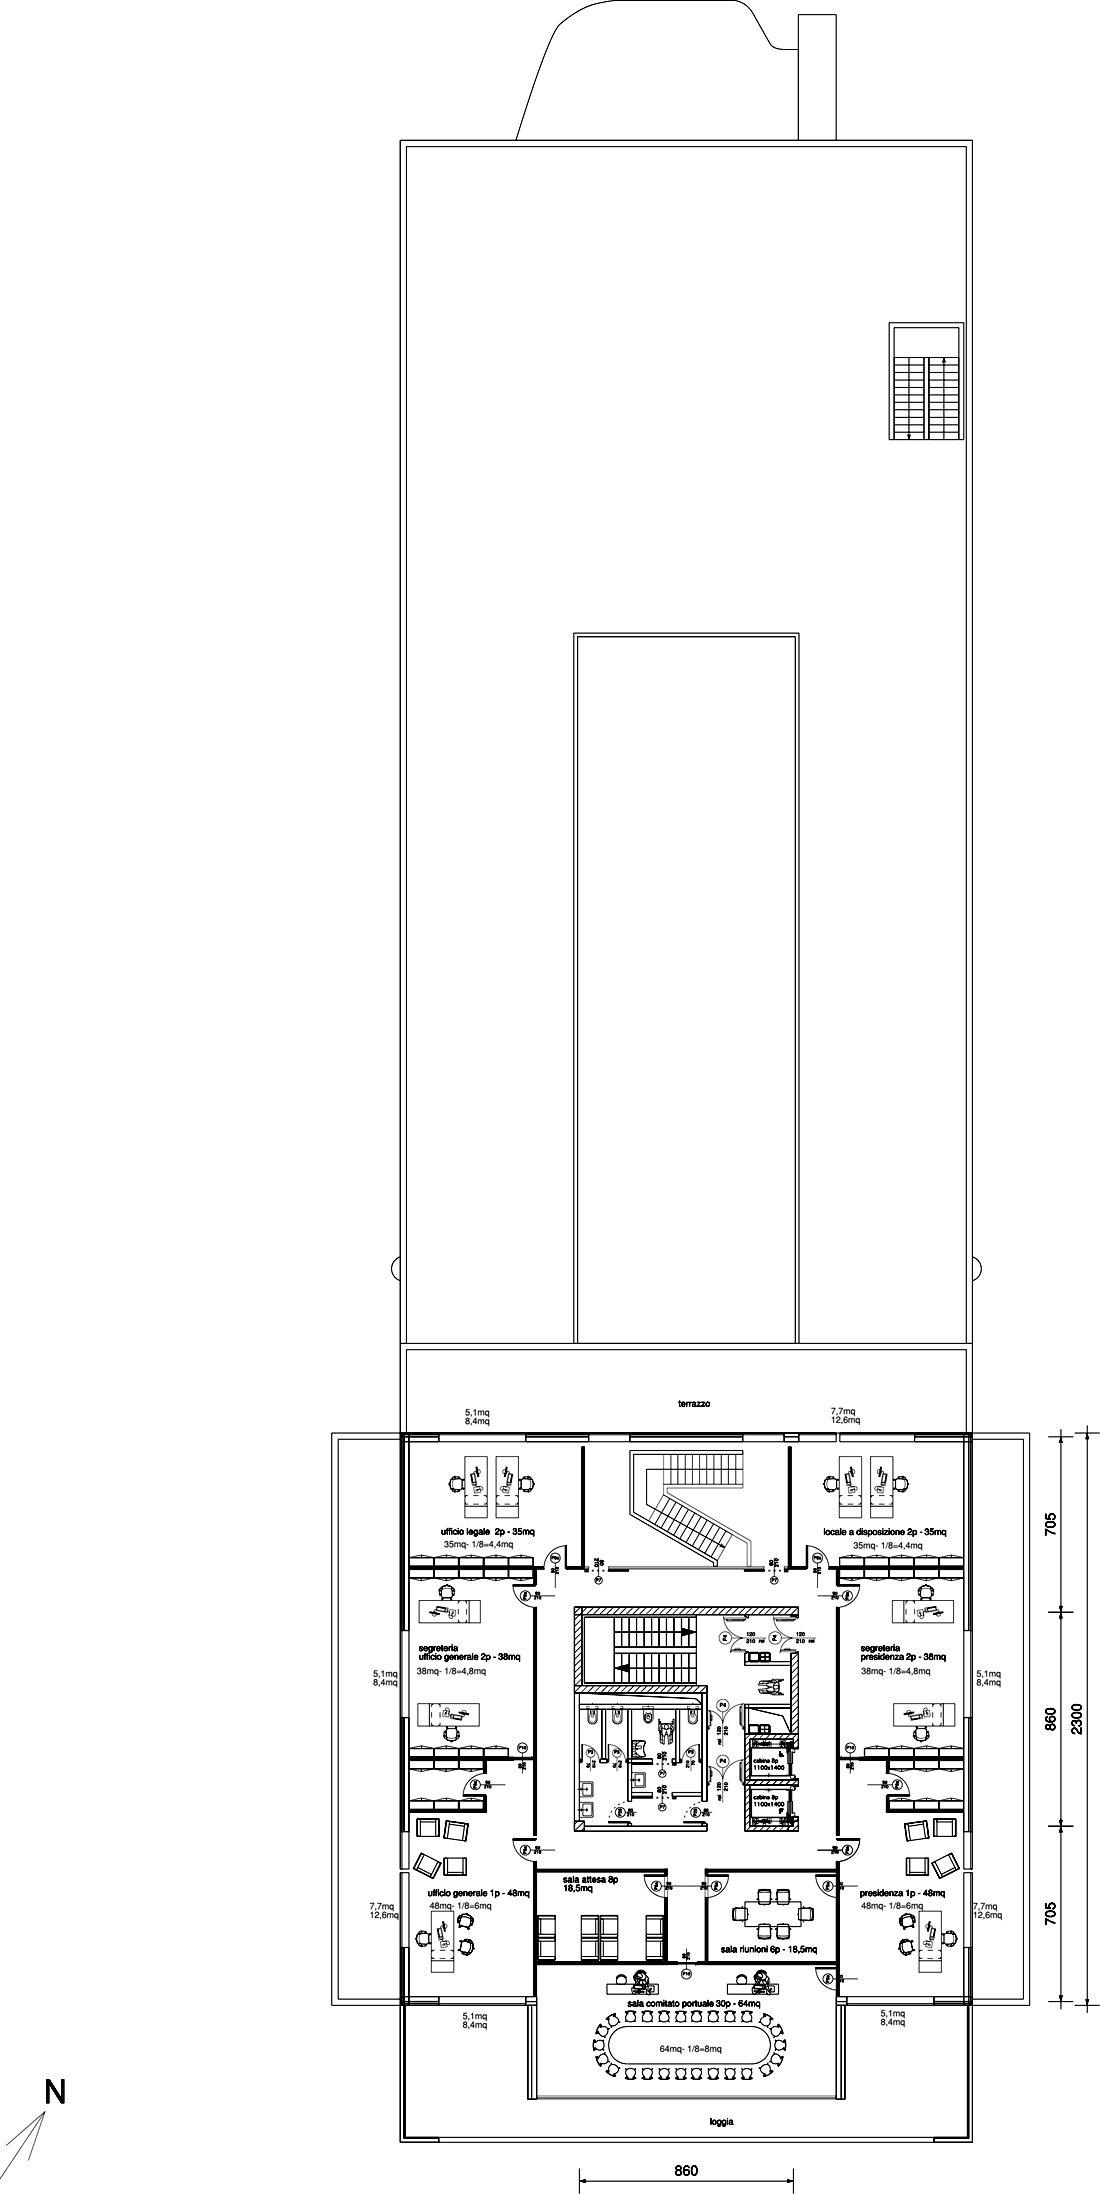 7th floor plan }